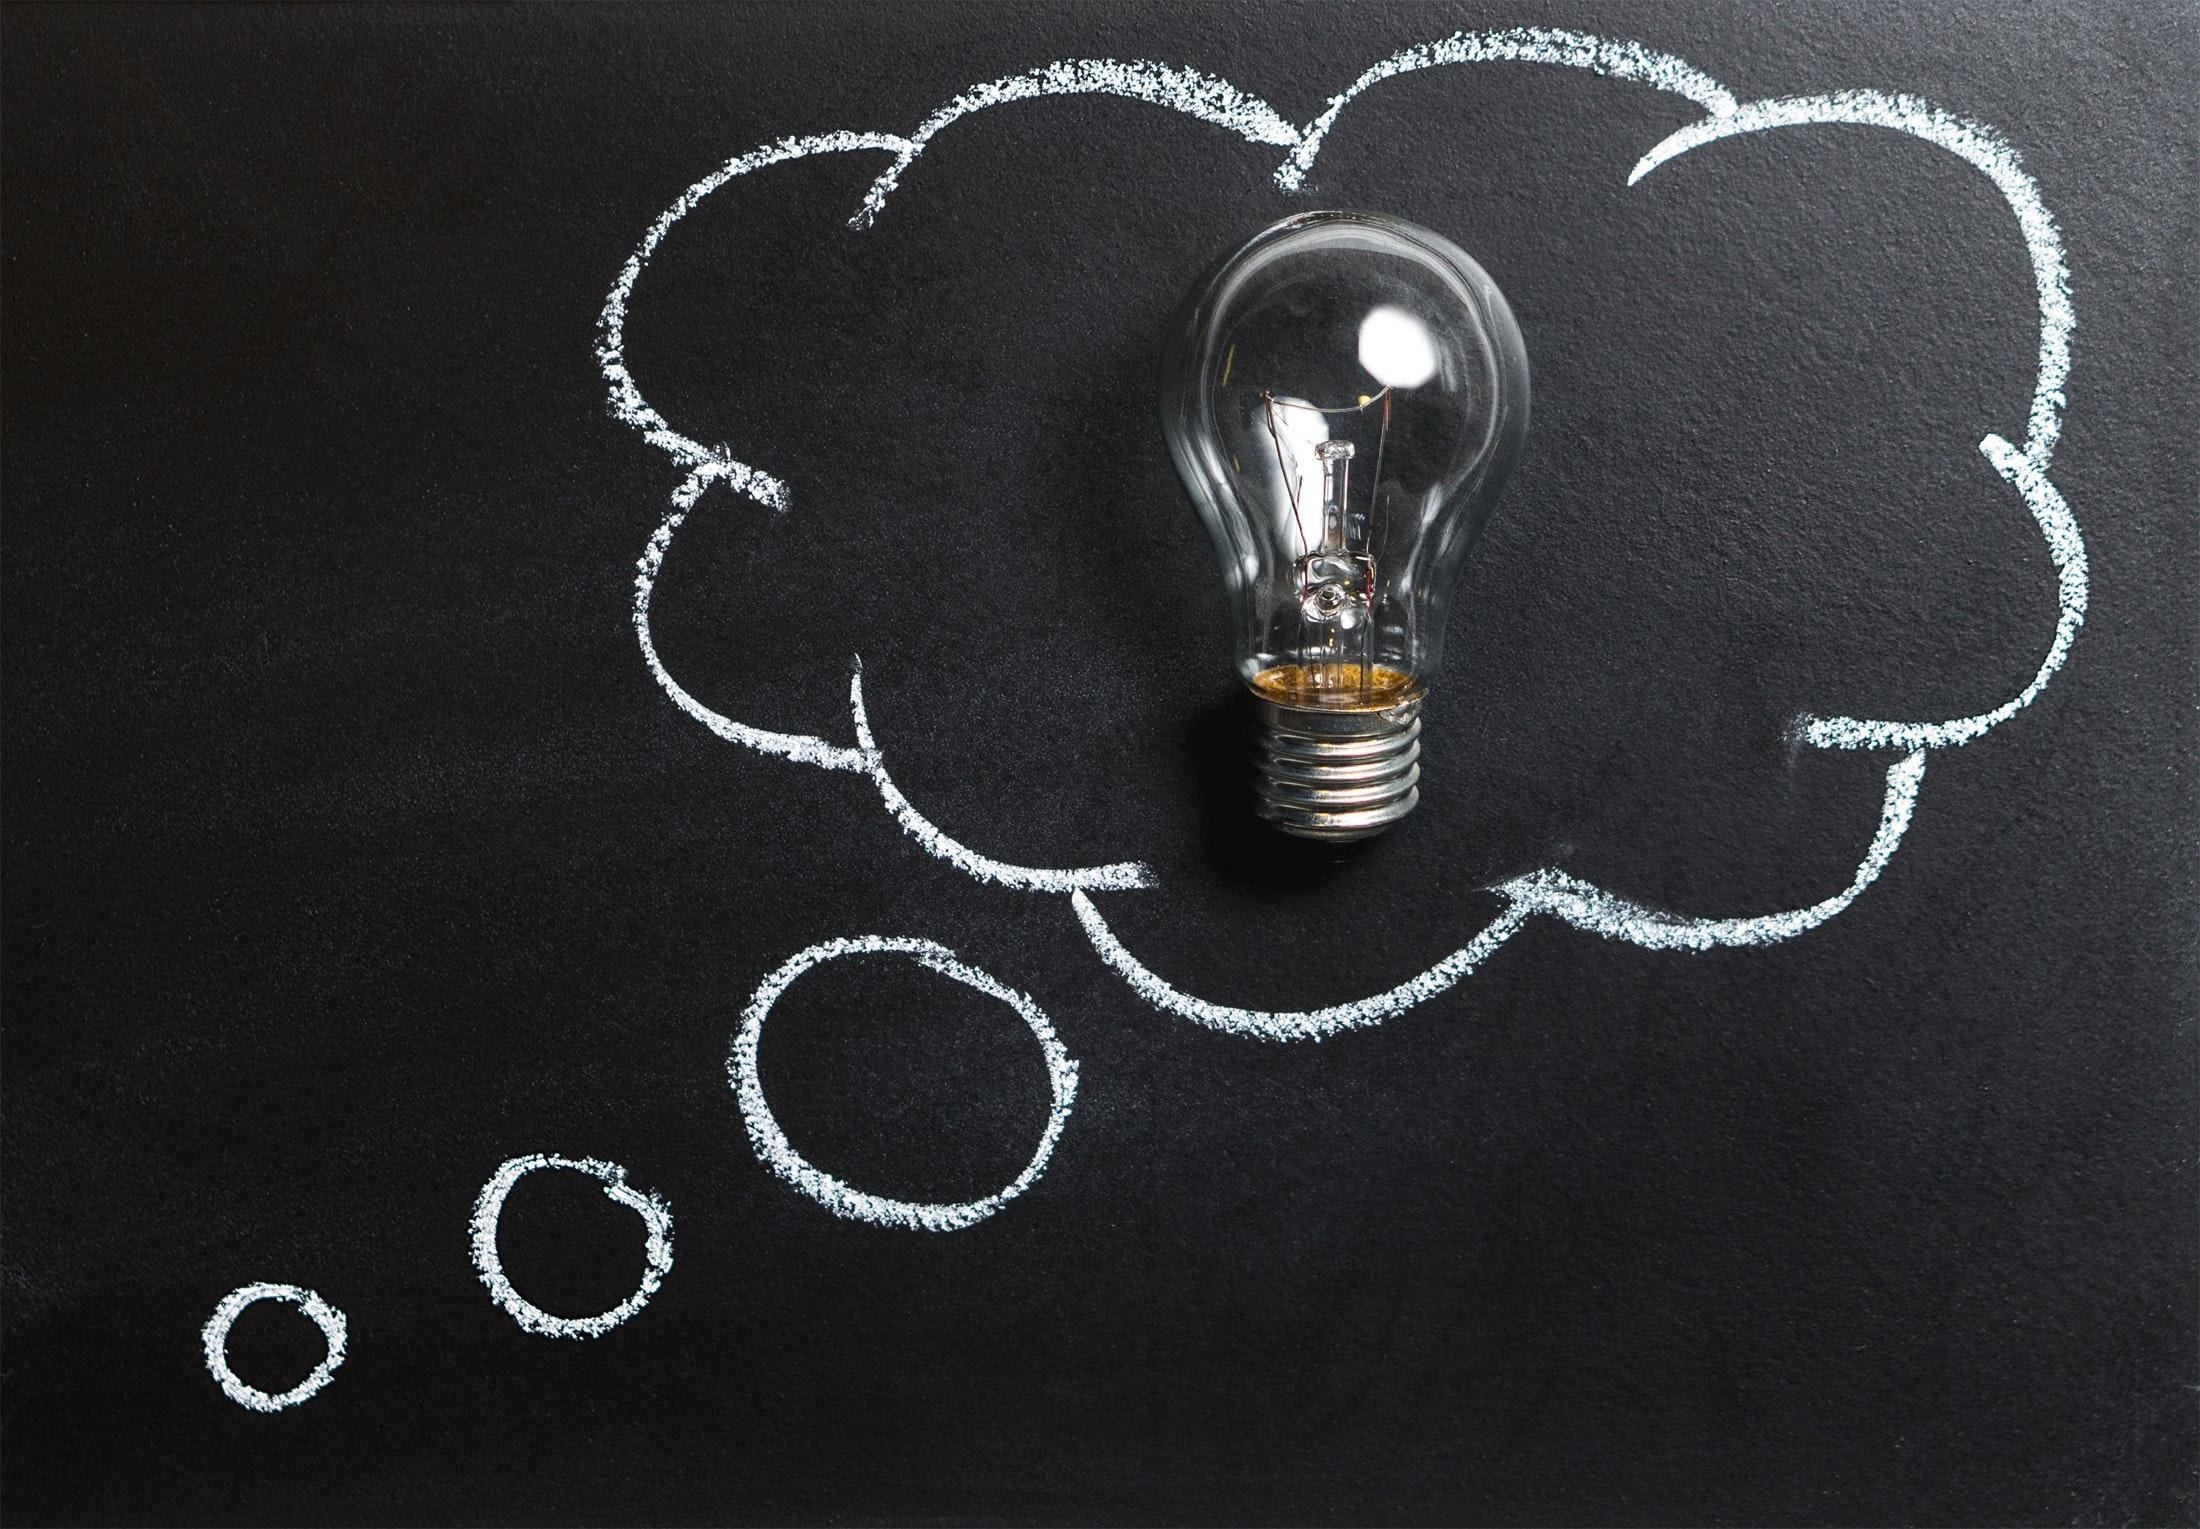 a light bulb inside a bubble thought